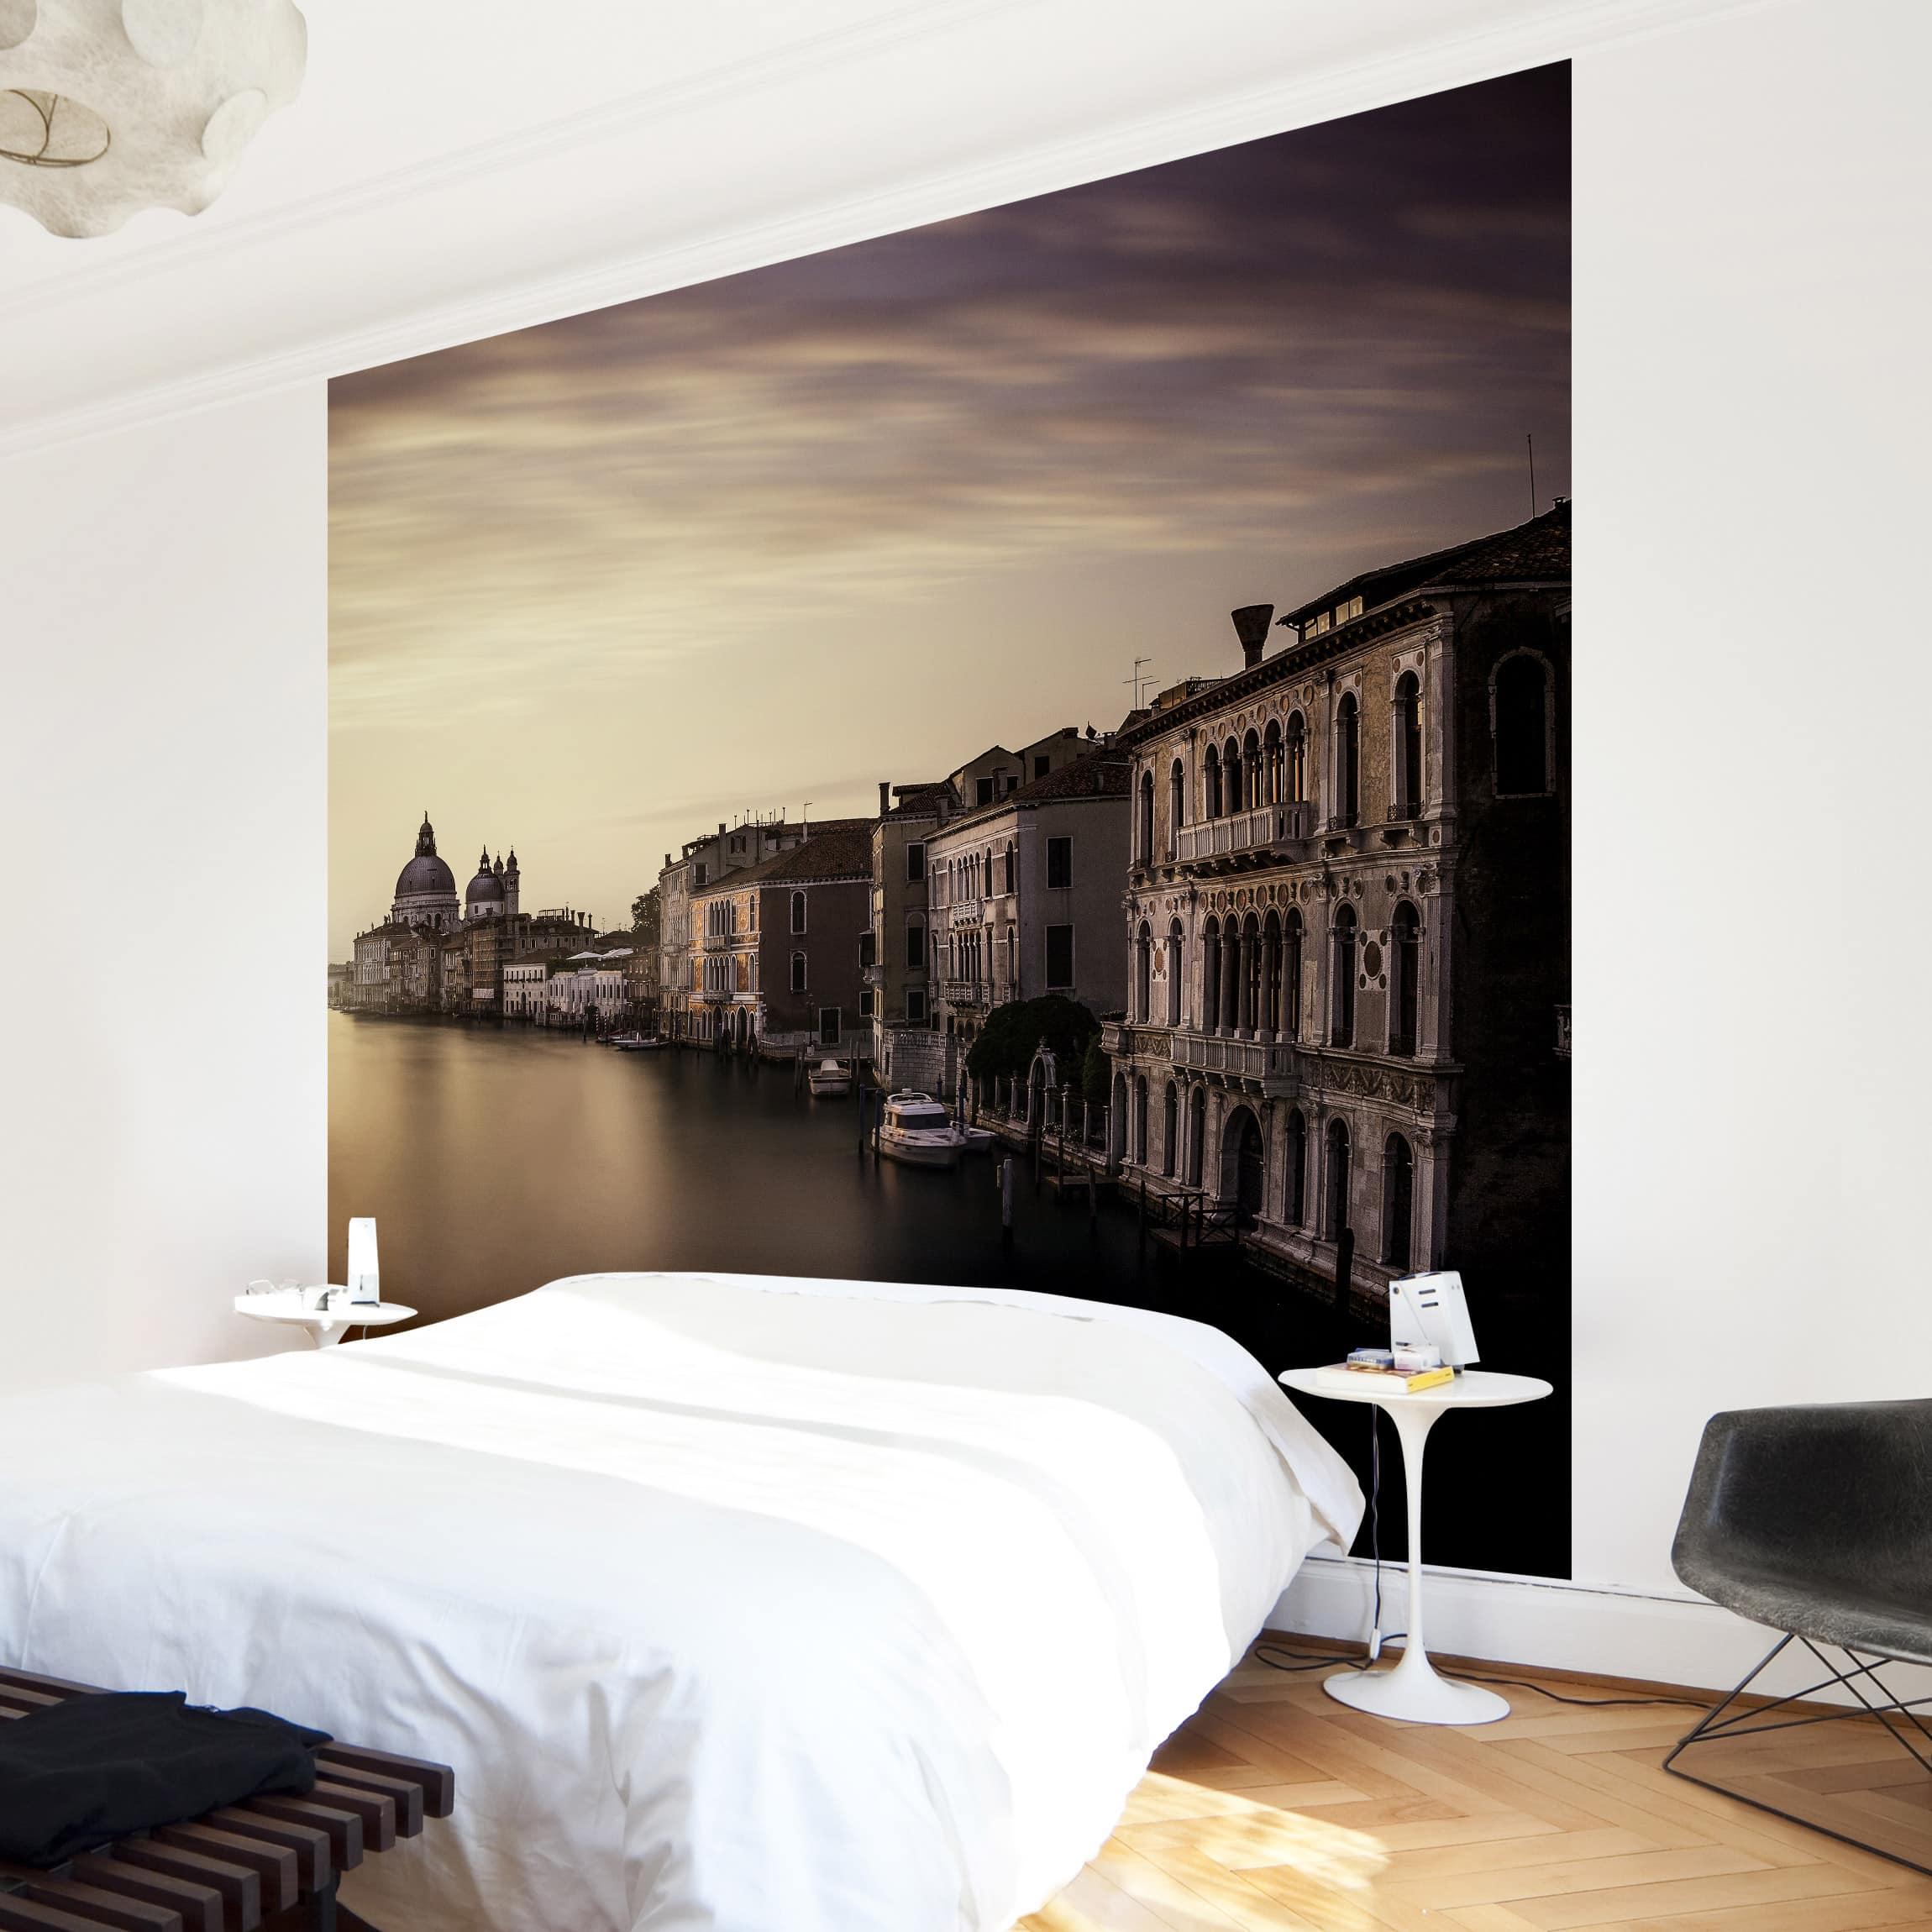 tapete selbstklebend abendstimmung in venedig wandbild quadratisch. Black Bedroom Furniture Sets. Home Design Ideas